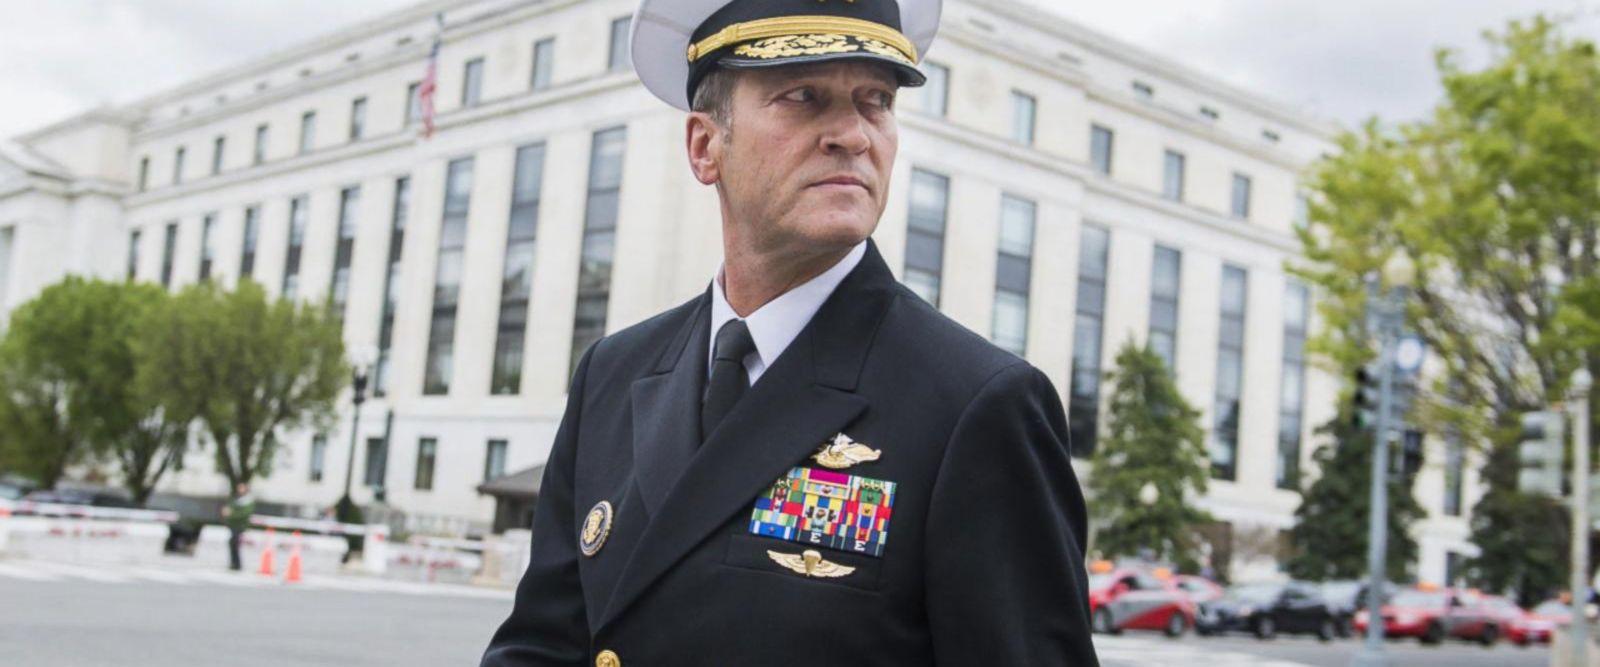 VIDEO: Trump's Veteran Affairs pick withdraws nomination